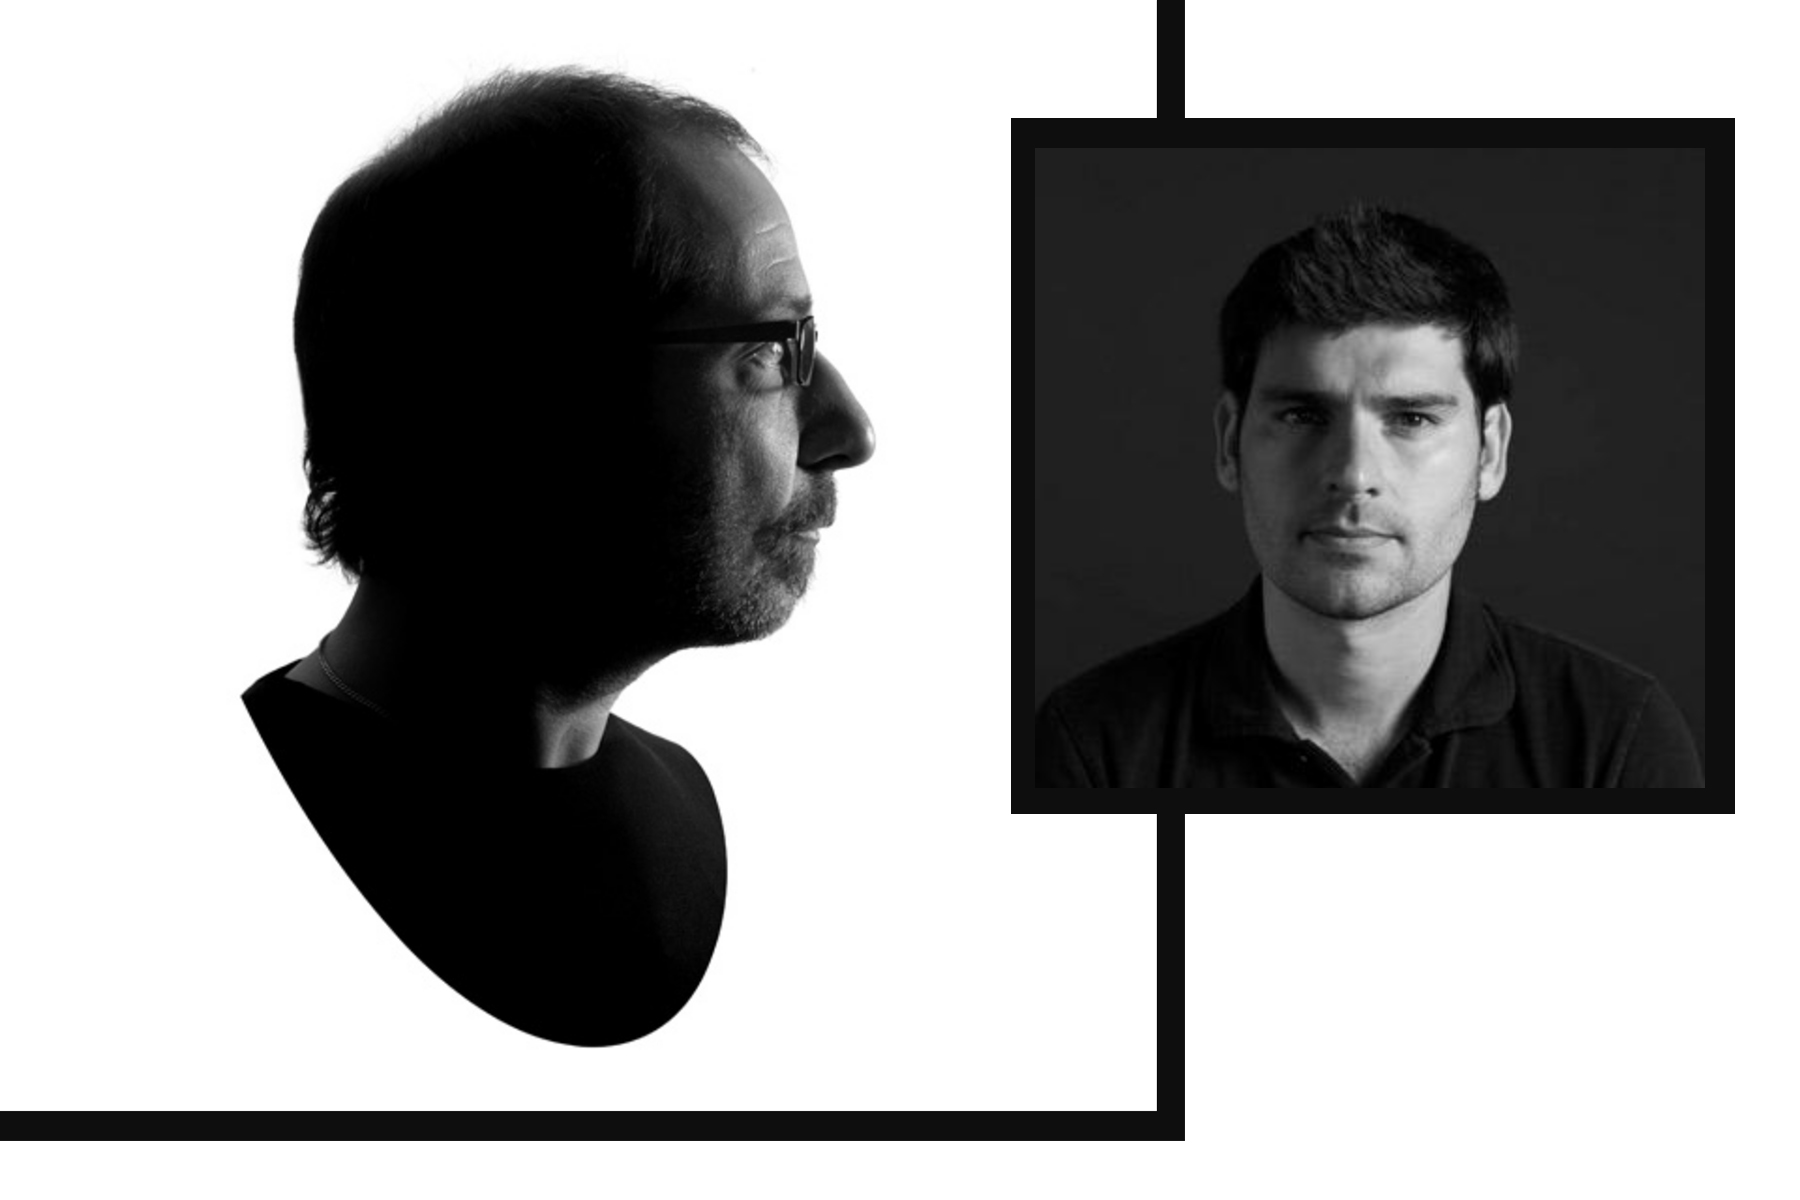 Designer Rick Valicenti ('73) + Architect Iker Gil